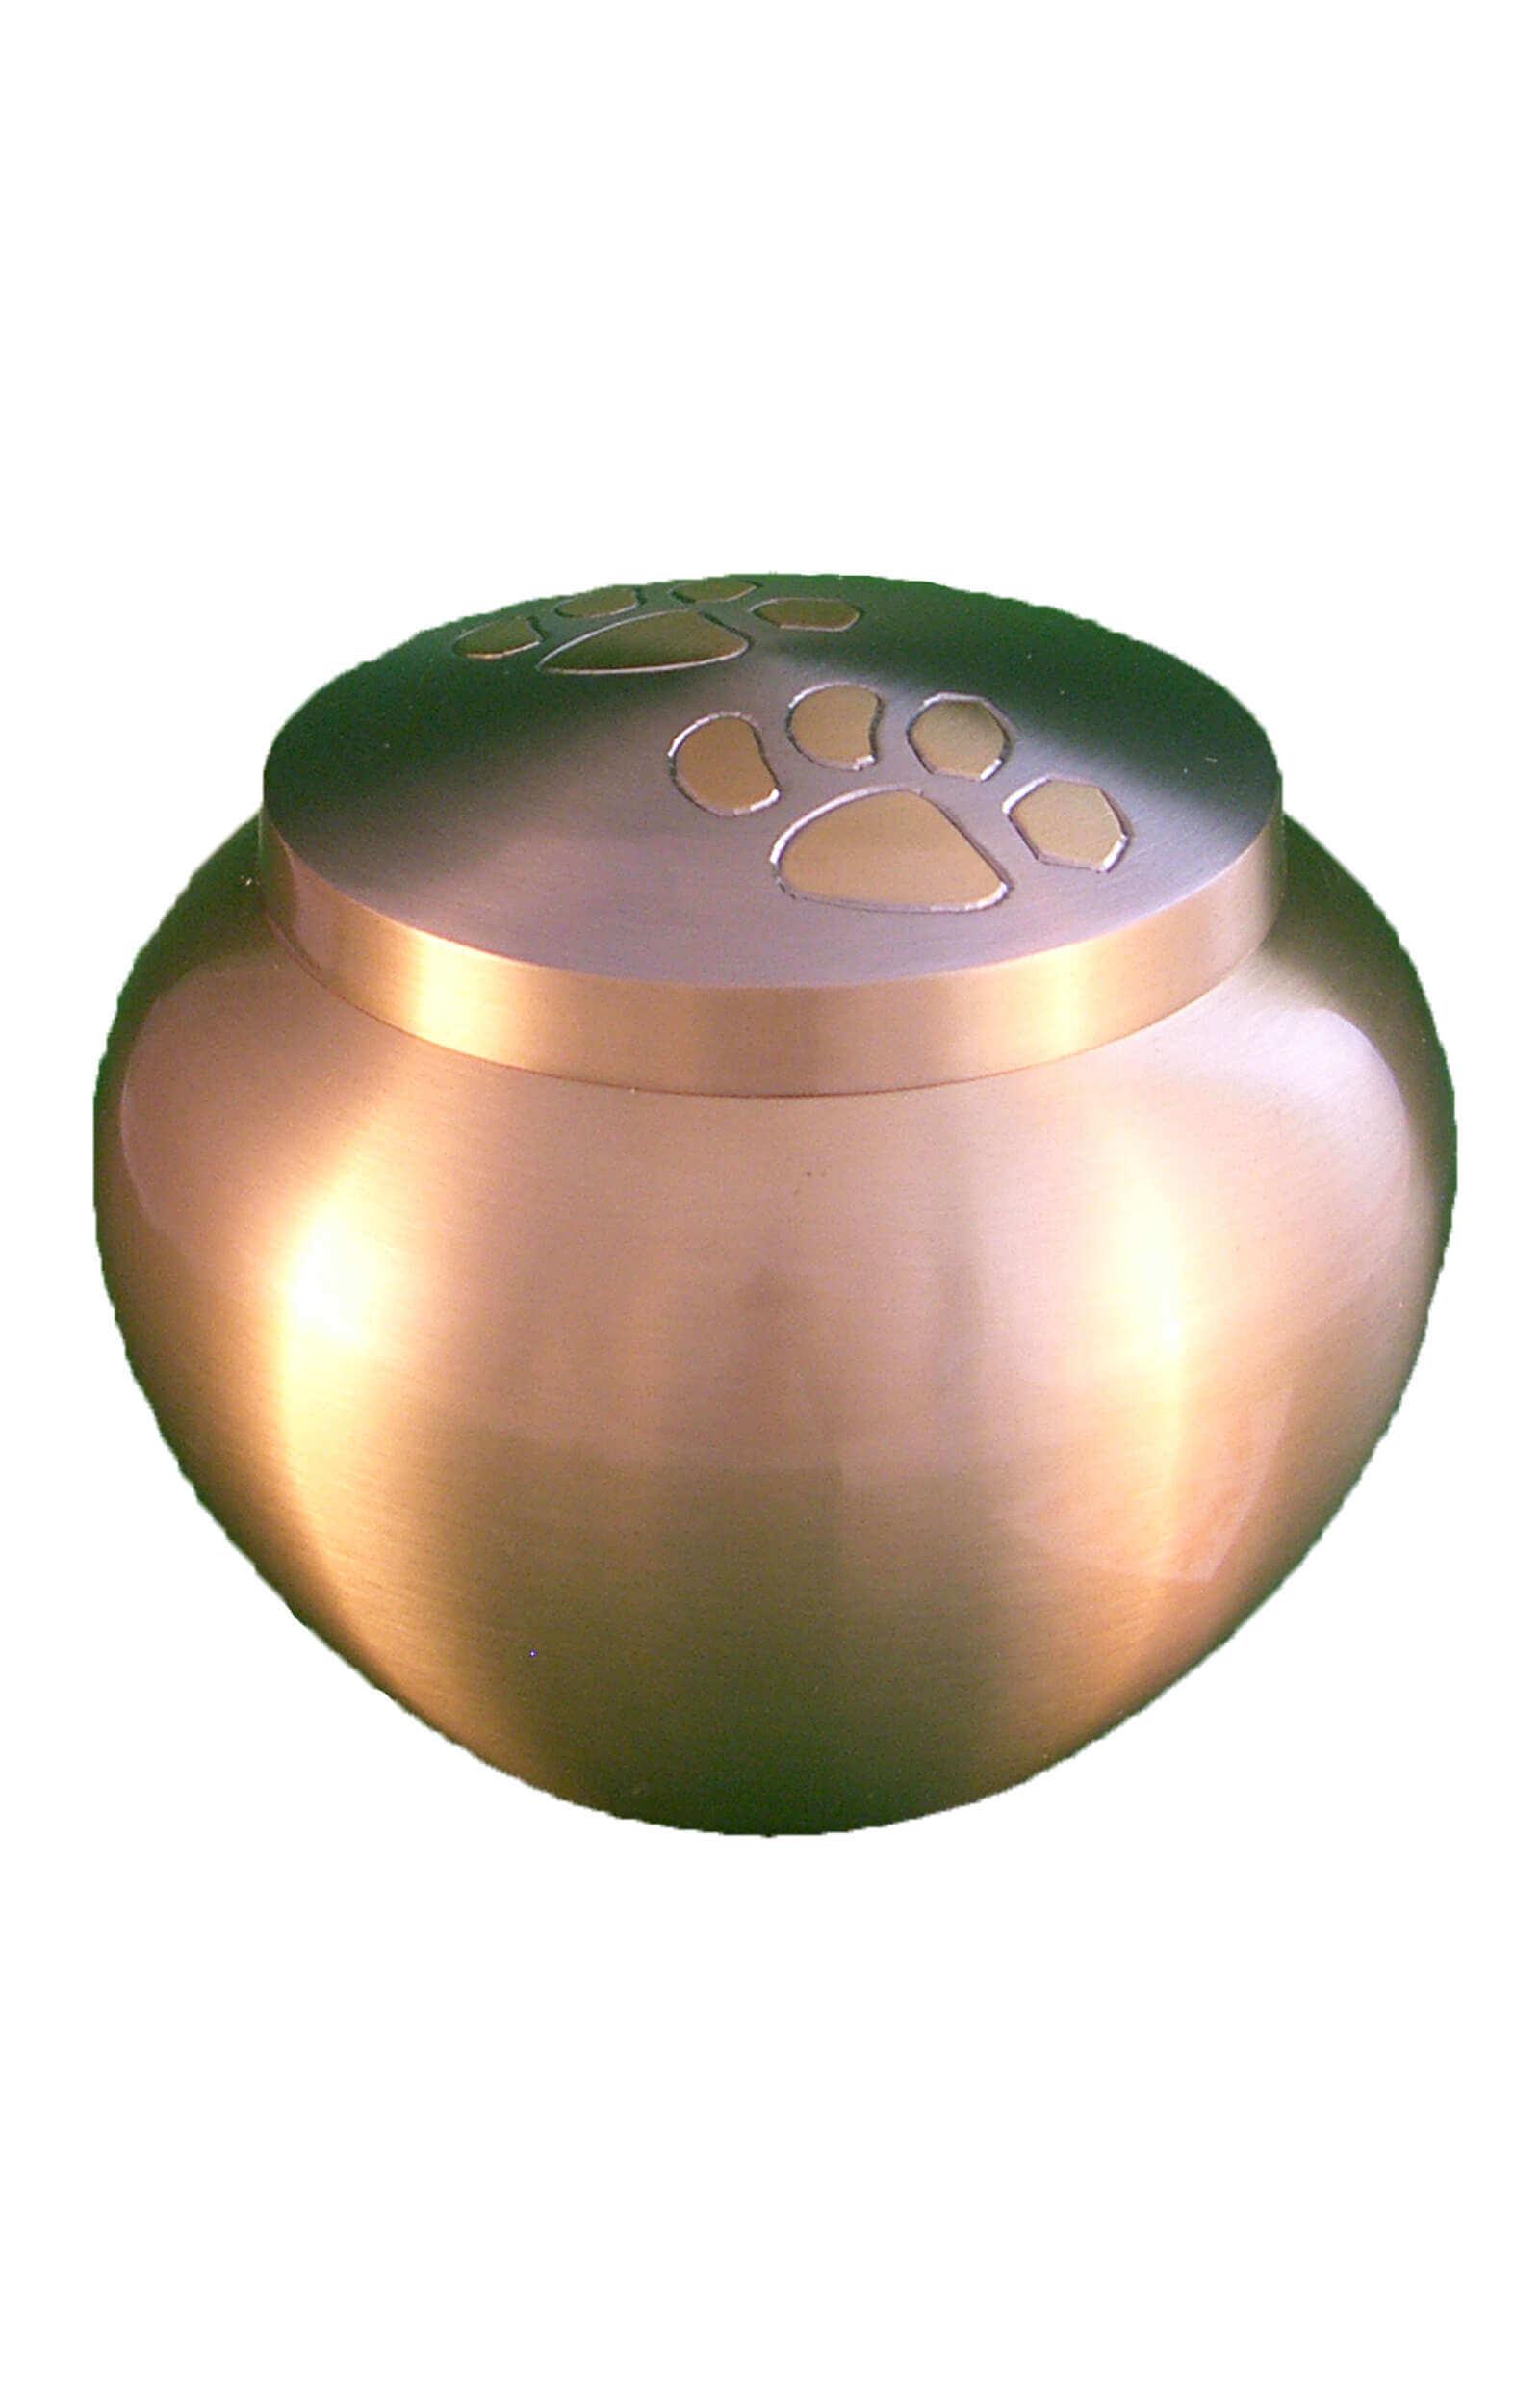 en TIB1545AEXL silver pawprint pet urn jpg